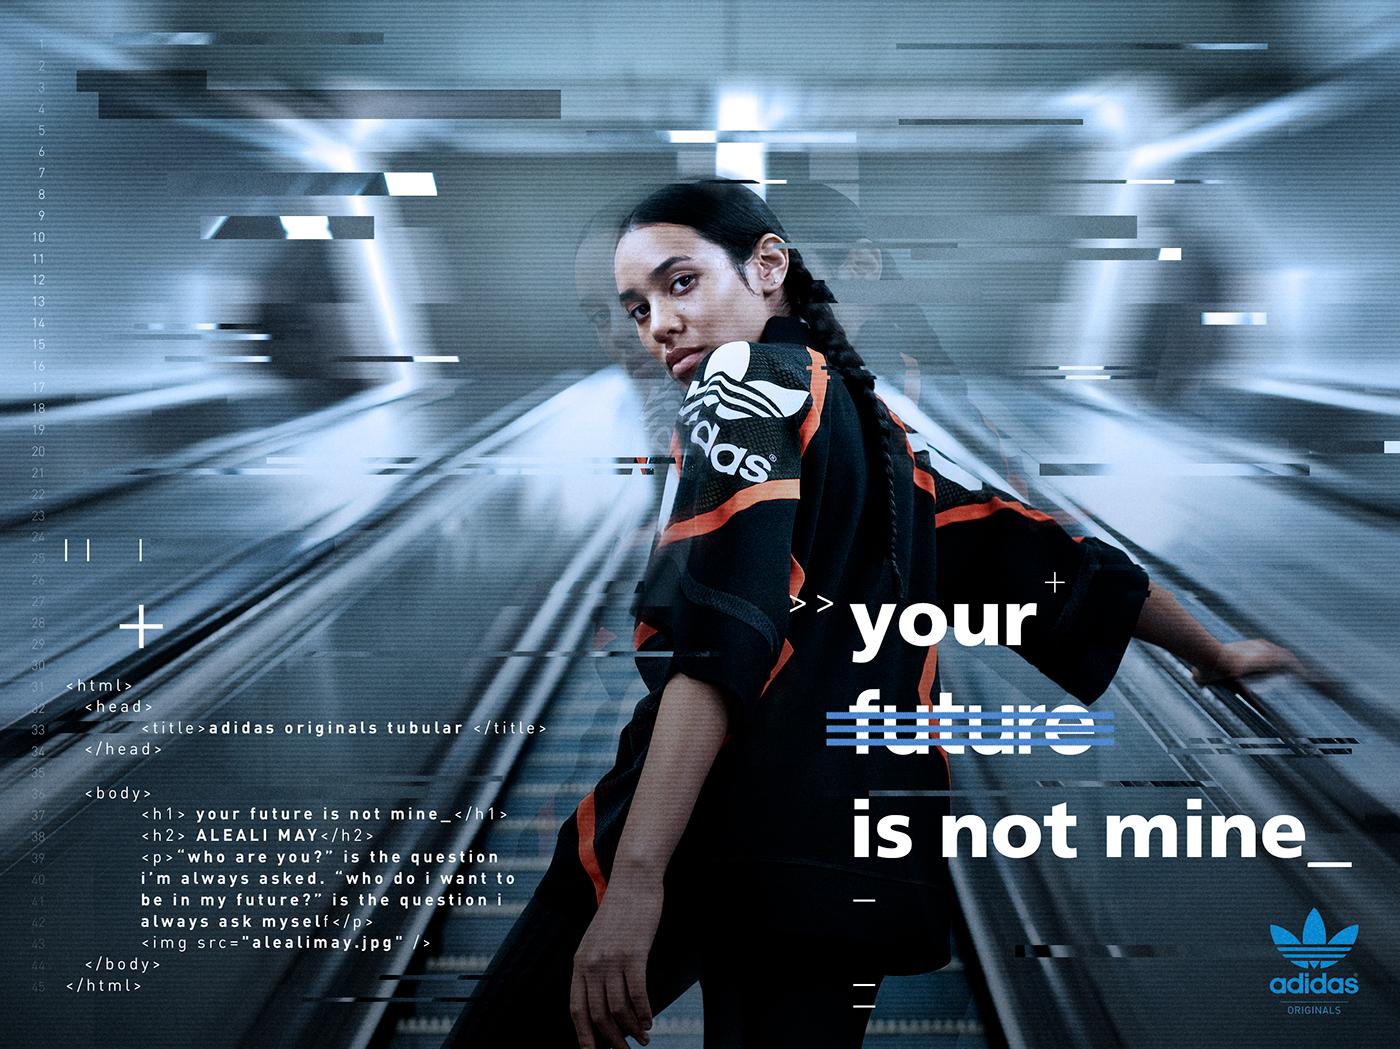 adidas original advert poster - photo #27